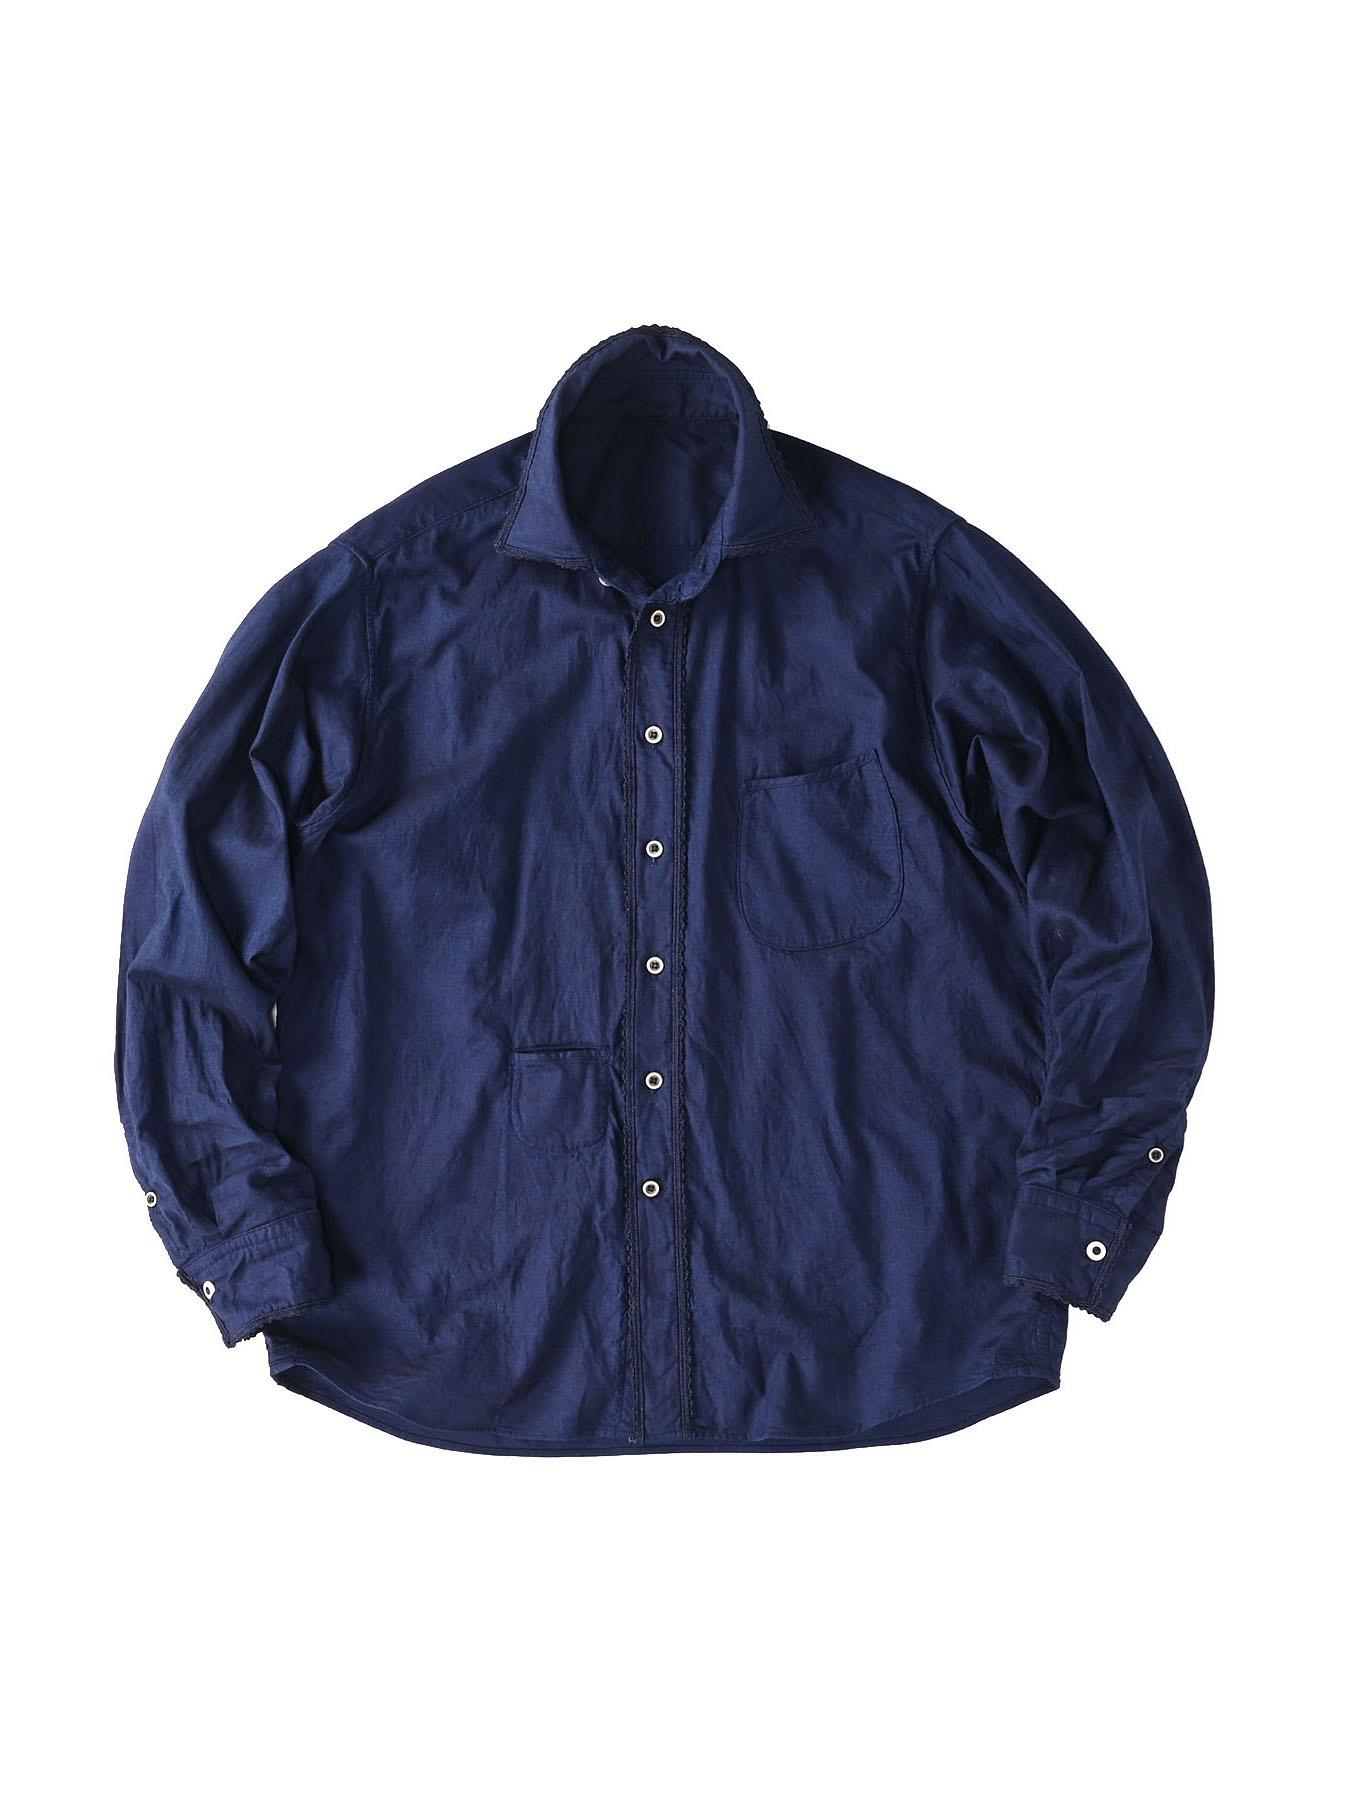 Indigo Thin Oxford 908 Ocean Lace Shirt (0621)-1